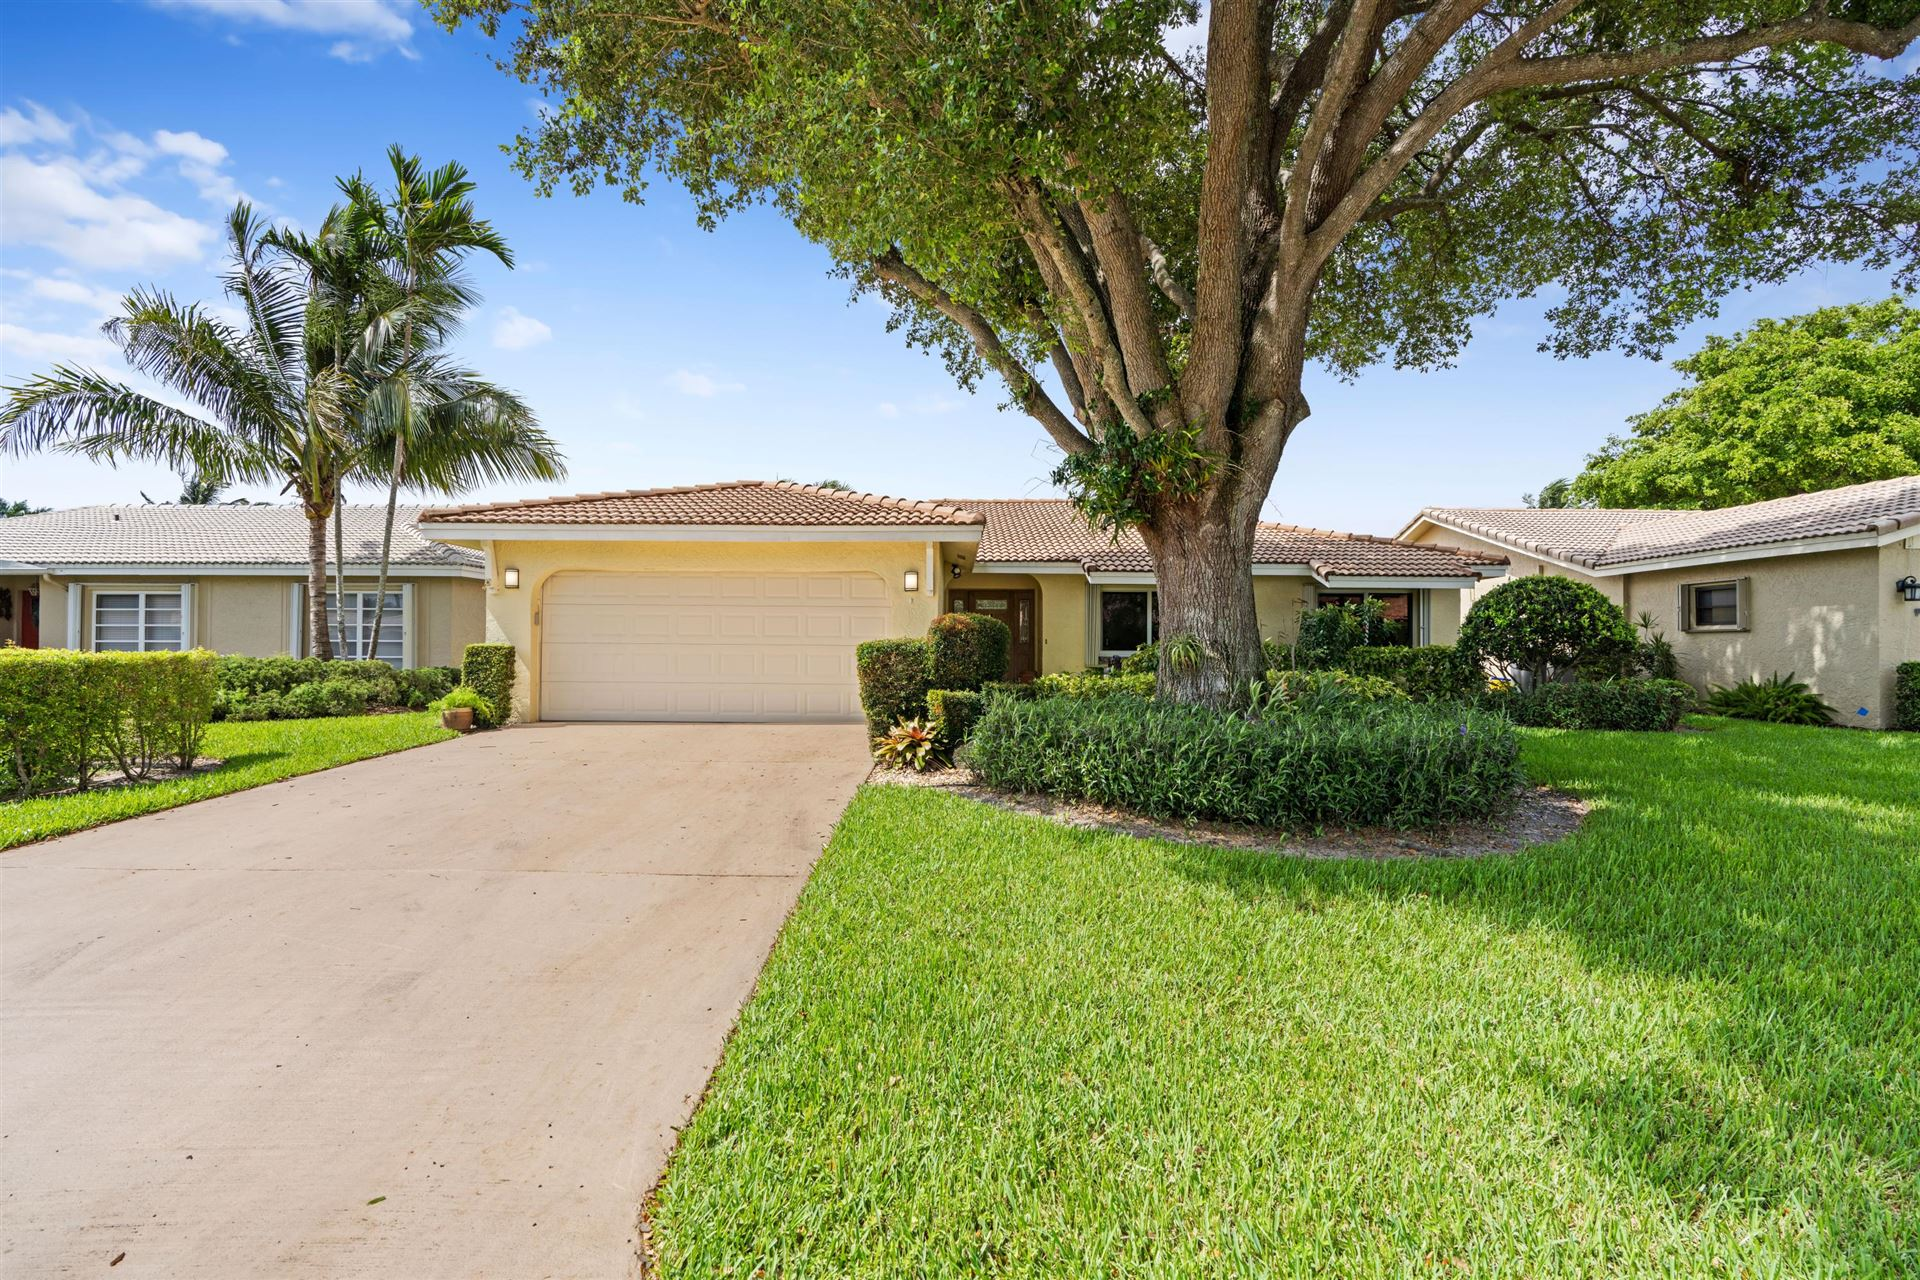 5860 Colony Court, Boca Raton, FL 33433 - MLS#: RX-10731759